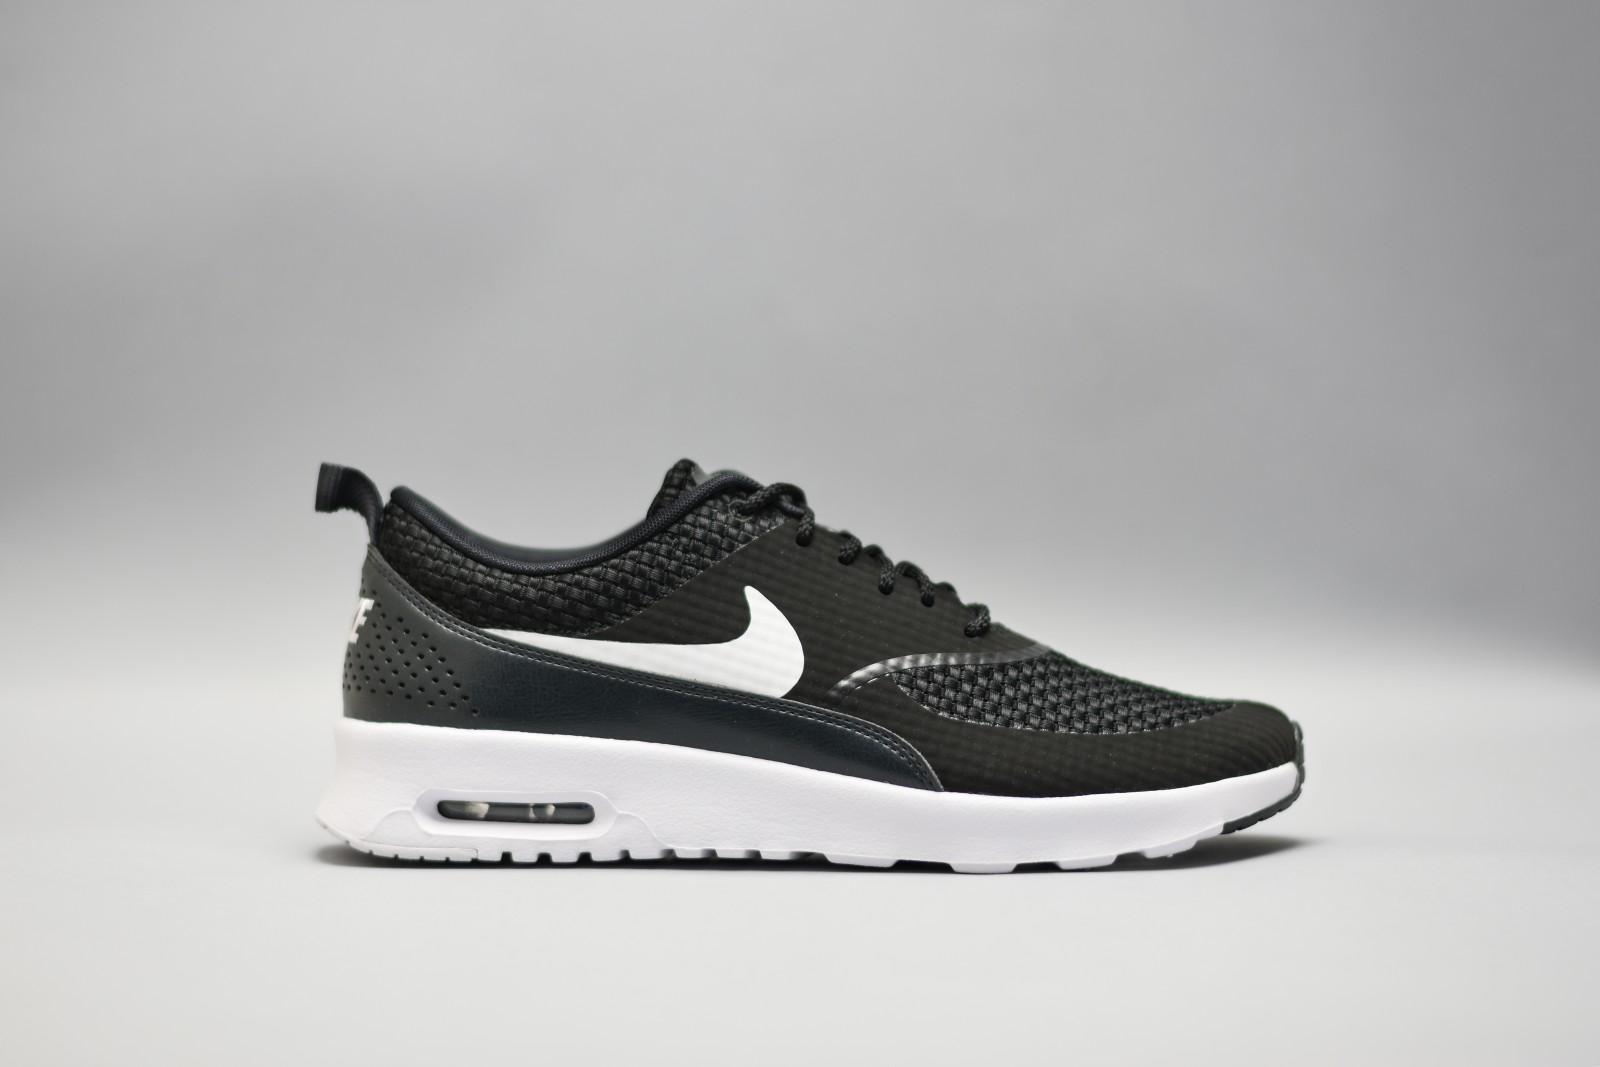 Dámské tenisky Nike WMNS AIR MAX THEA PRM BLACK WHITE-ANTHRACITE ... 97ab7f3f4ba